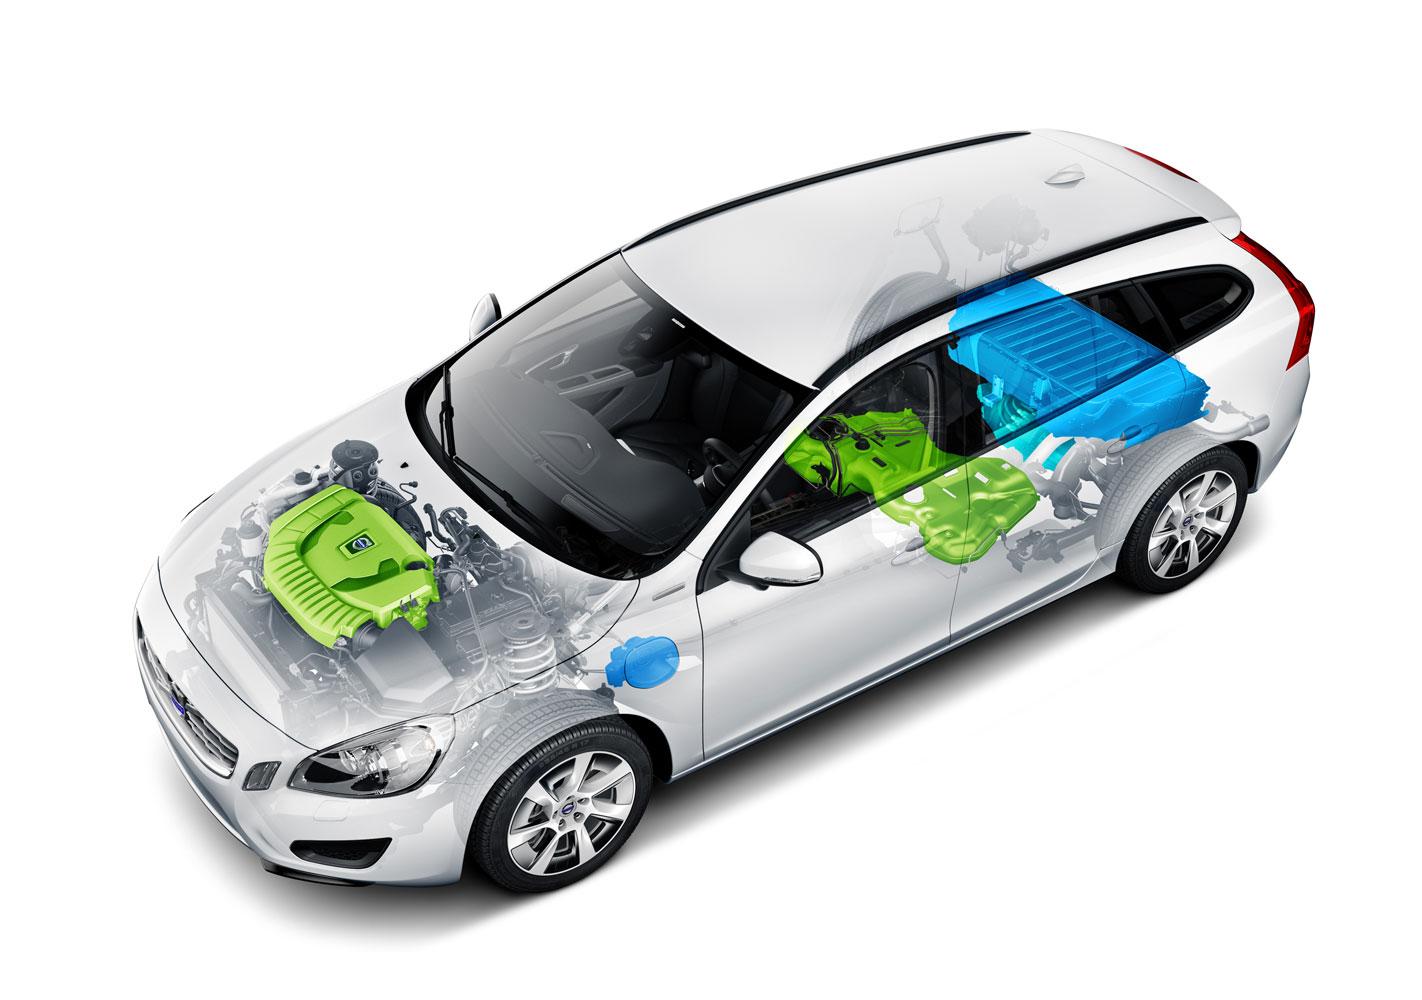 volvo v60 hybrid ist sicherstes auto mit elektromotor. Black Bedroom Furniture Sets. Home Design Ideas